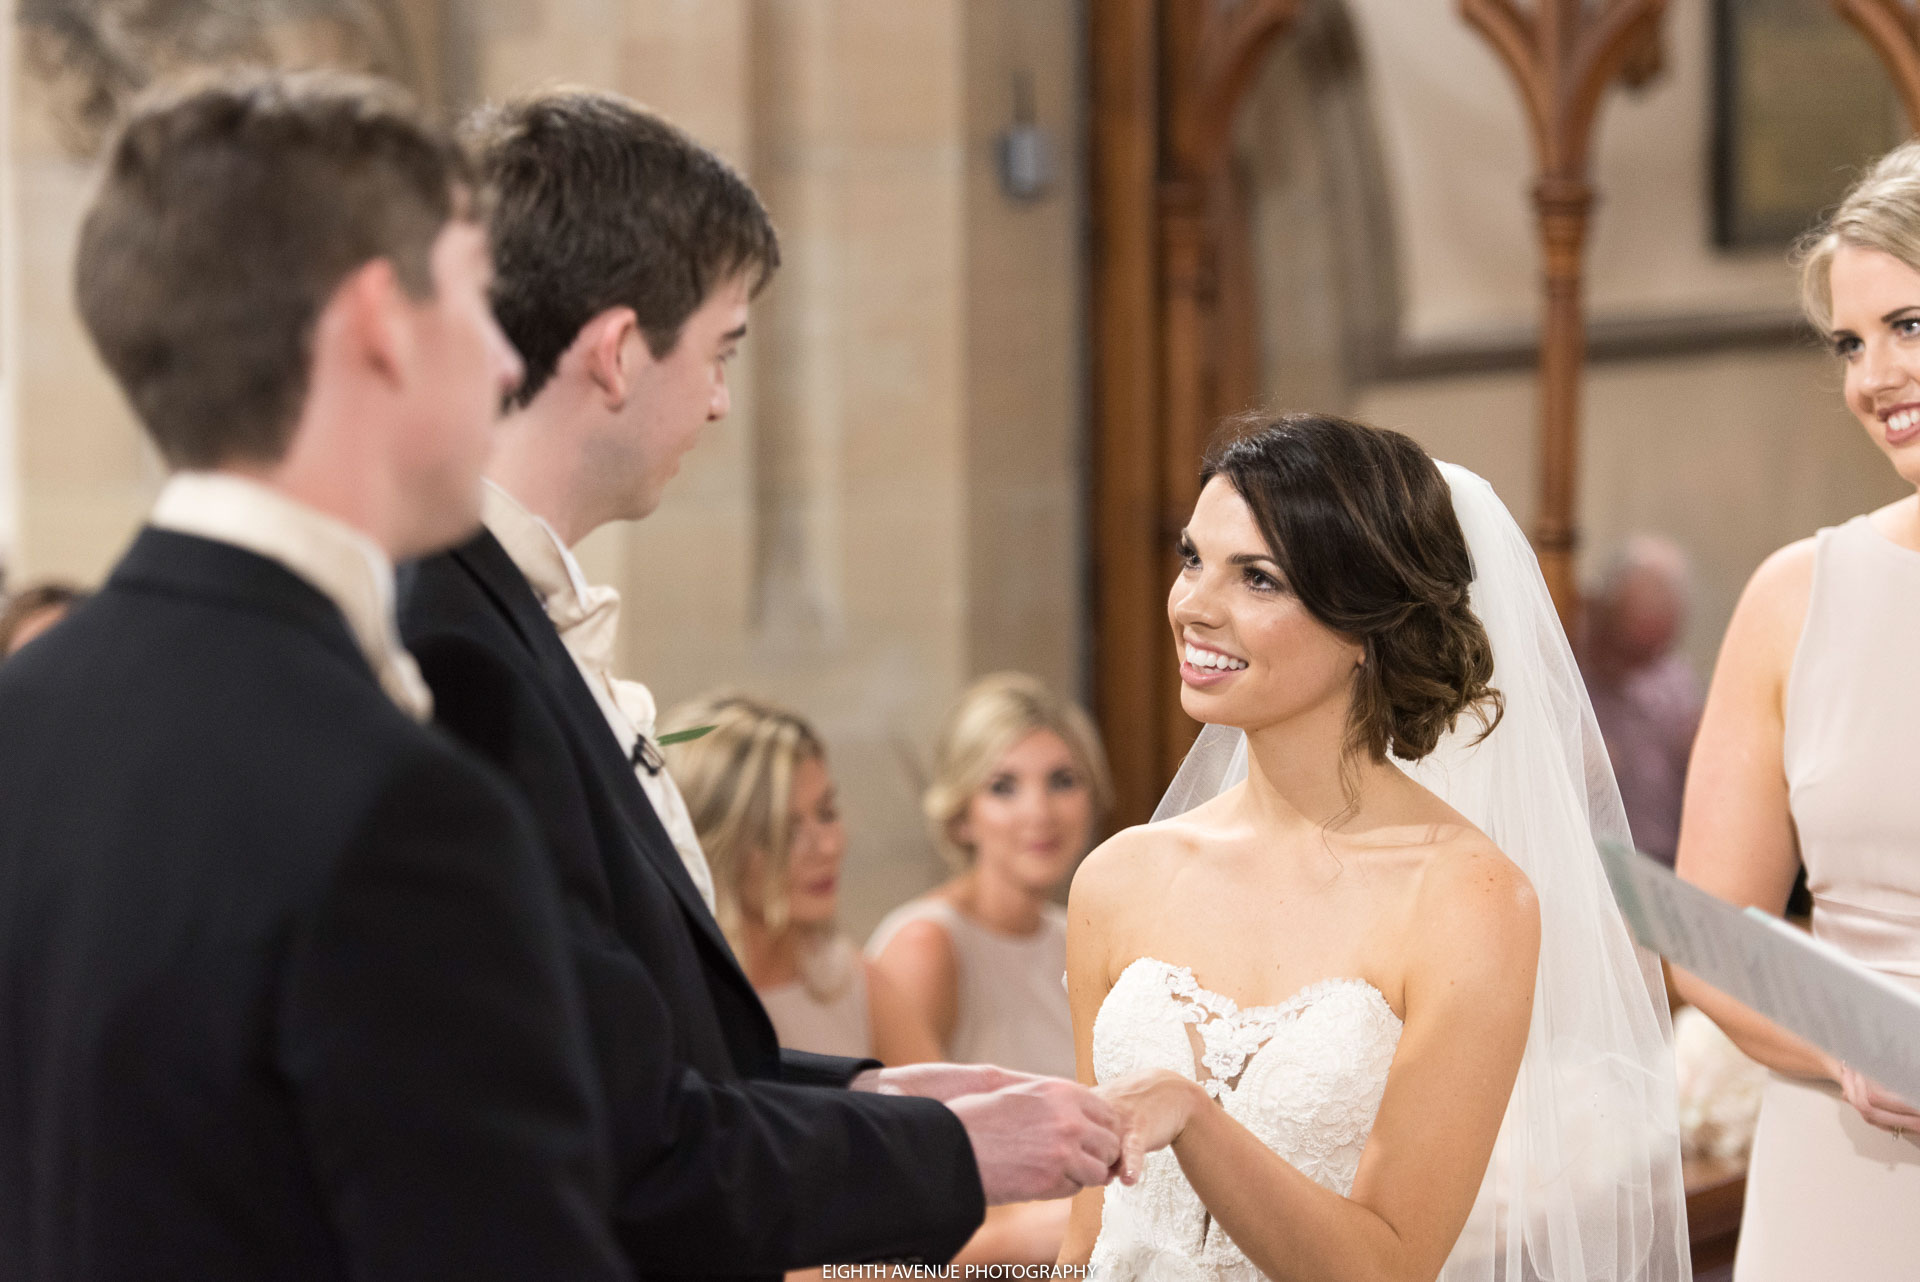 Bride smiling at wedding